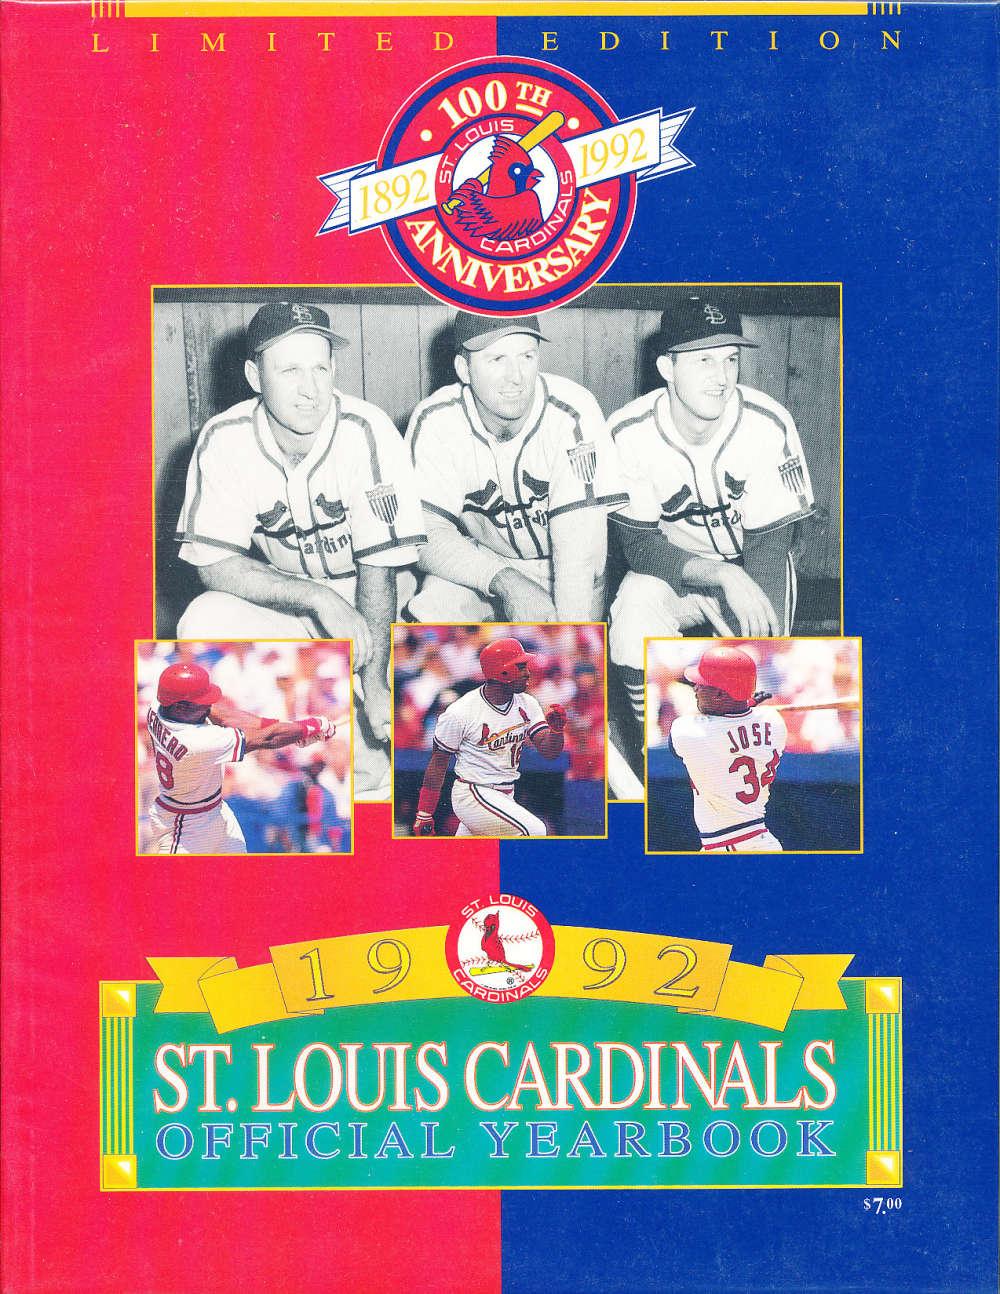 1992 St Louis Cardinals Baseball Yearbook